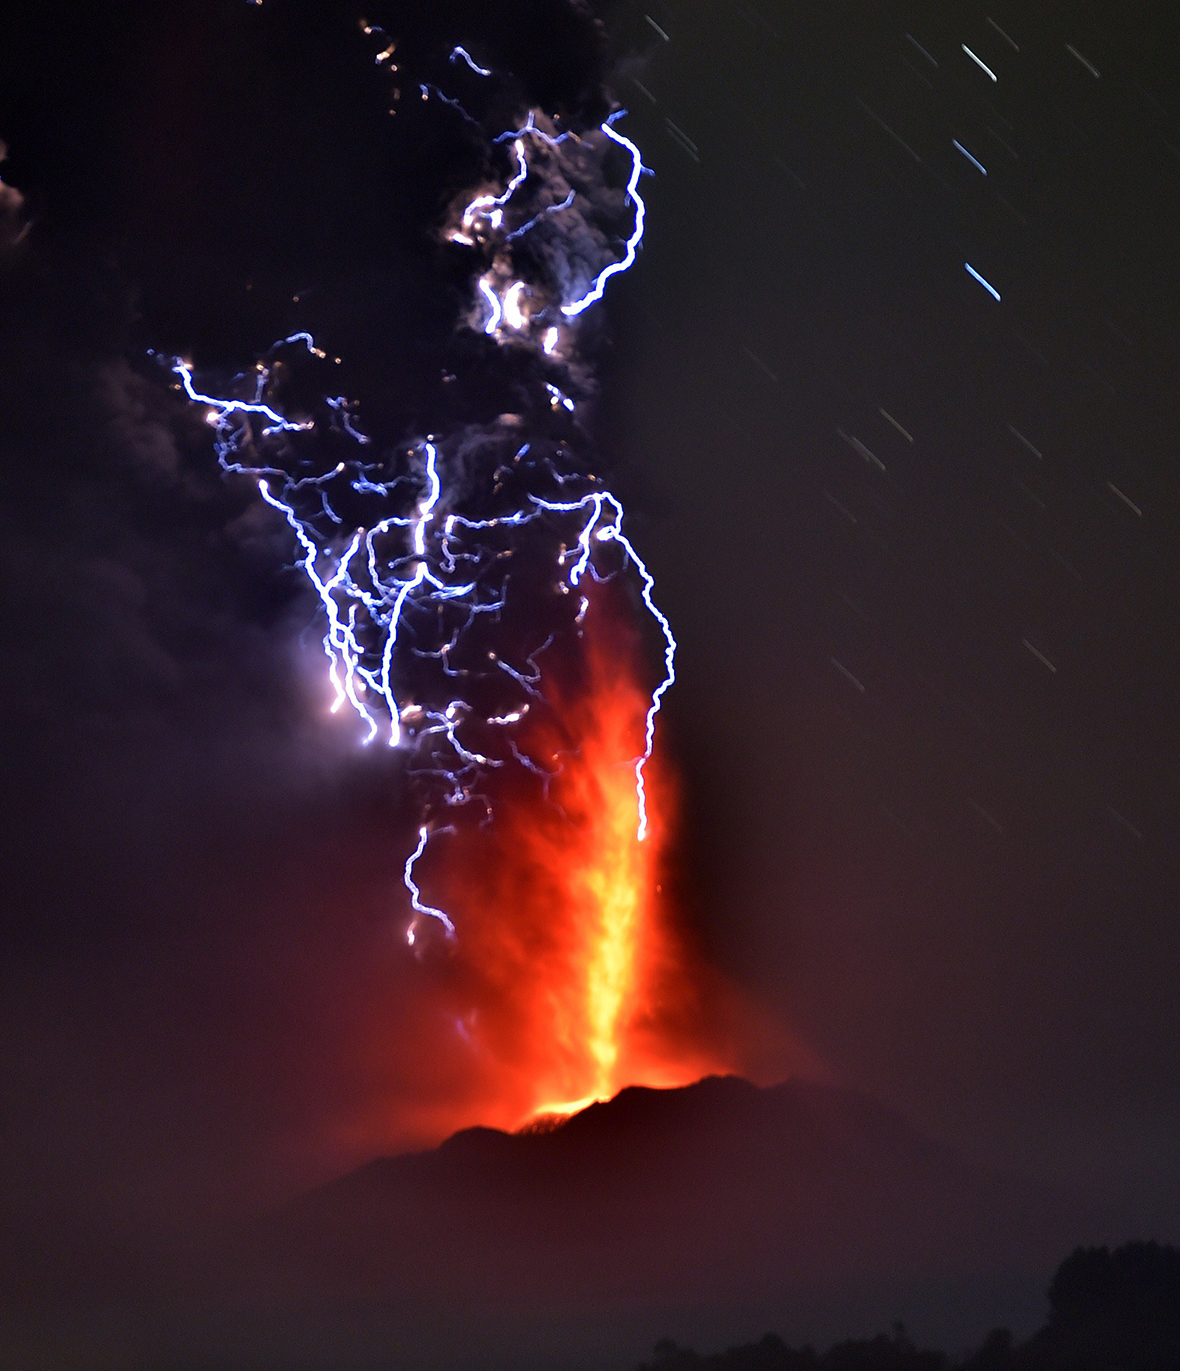 Volcanoes erupting lava with lightning